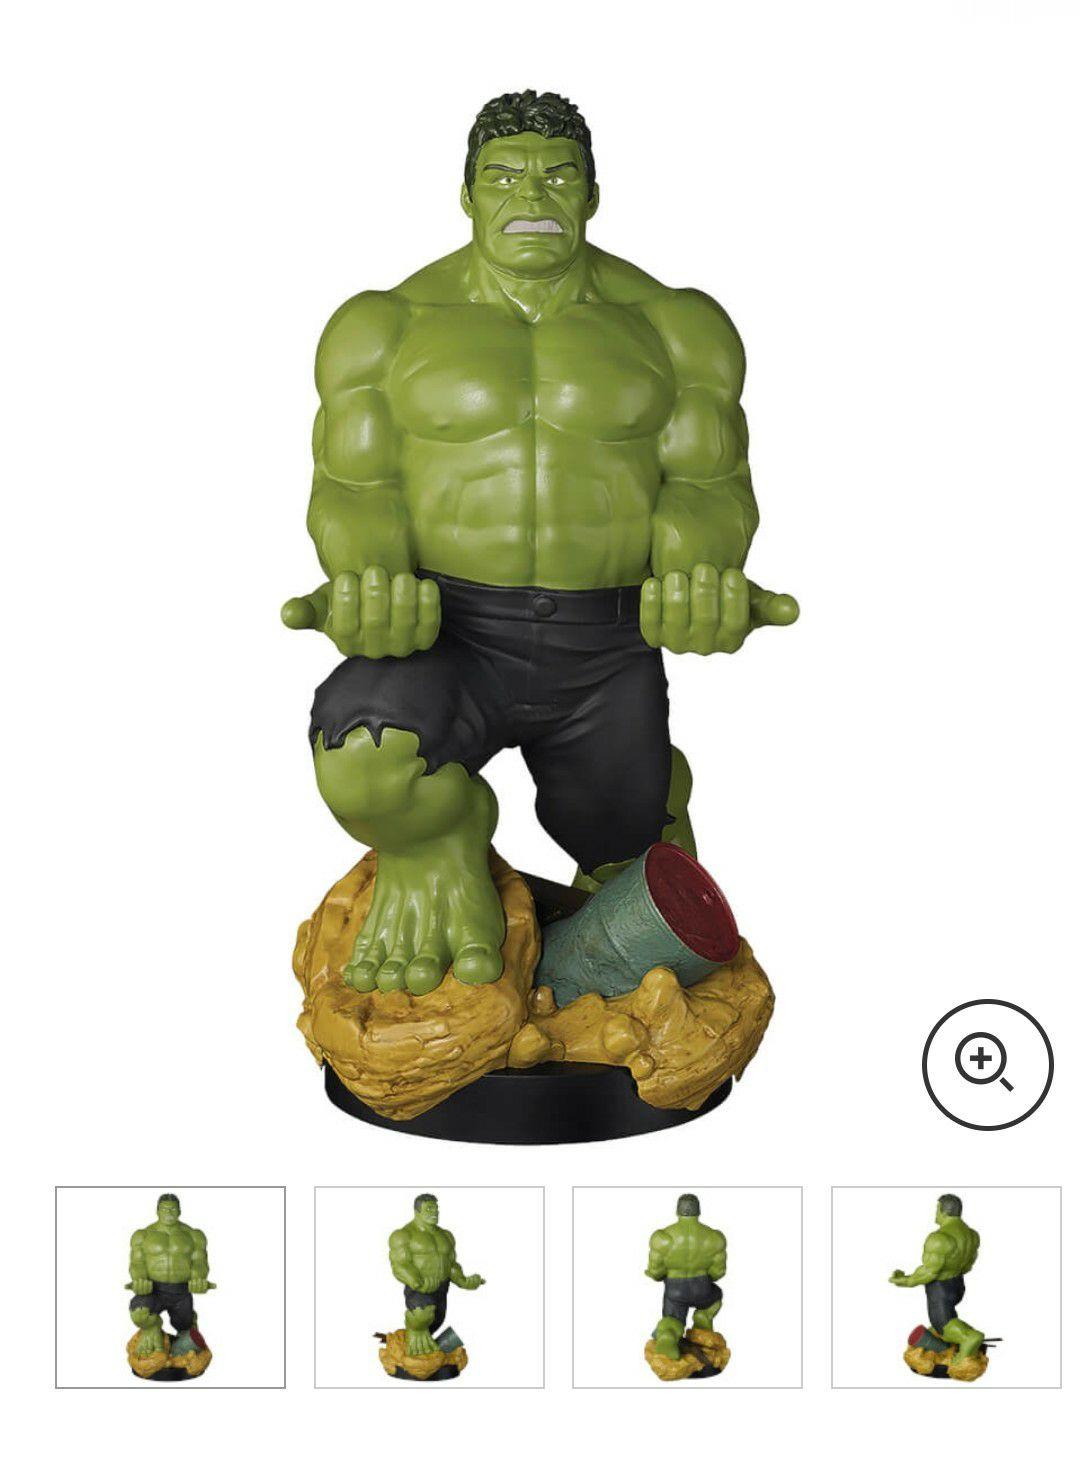 Soporte Mando o Móvil Marvel Hulk (30 cm) - Cable Guy